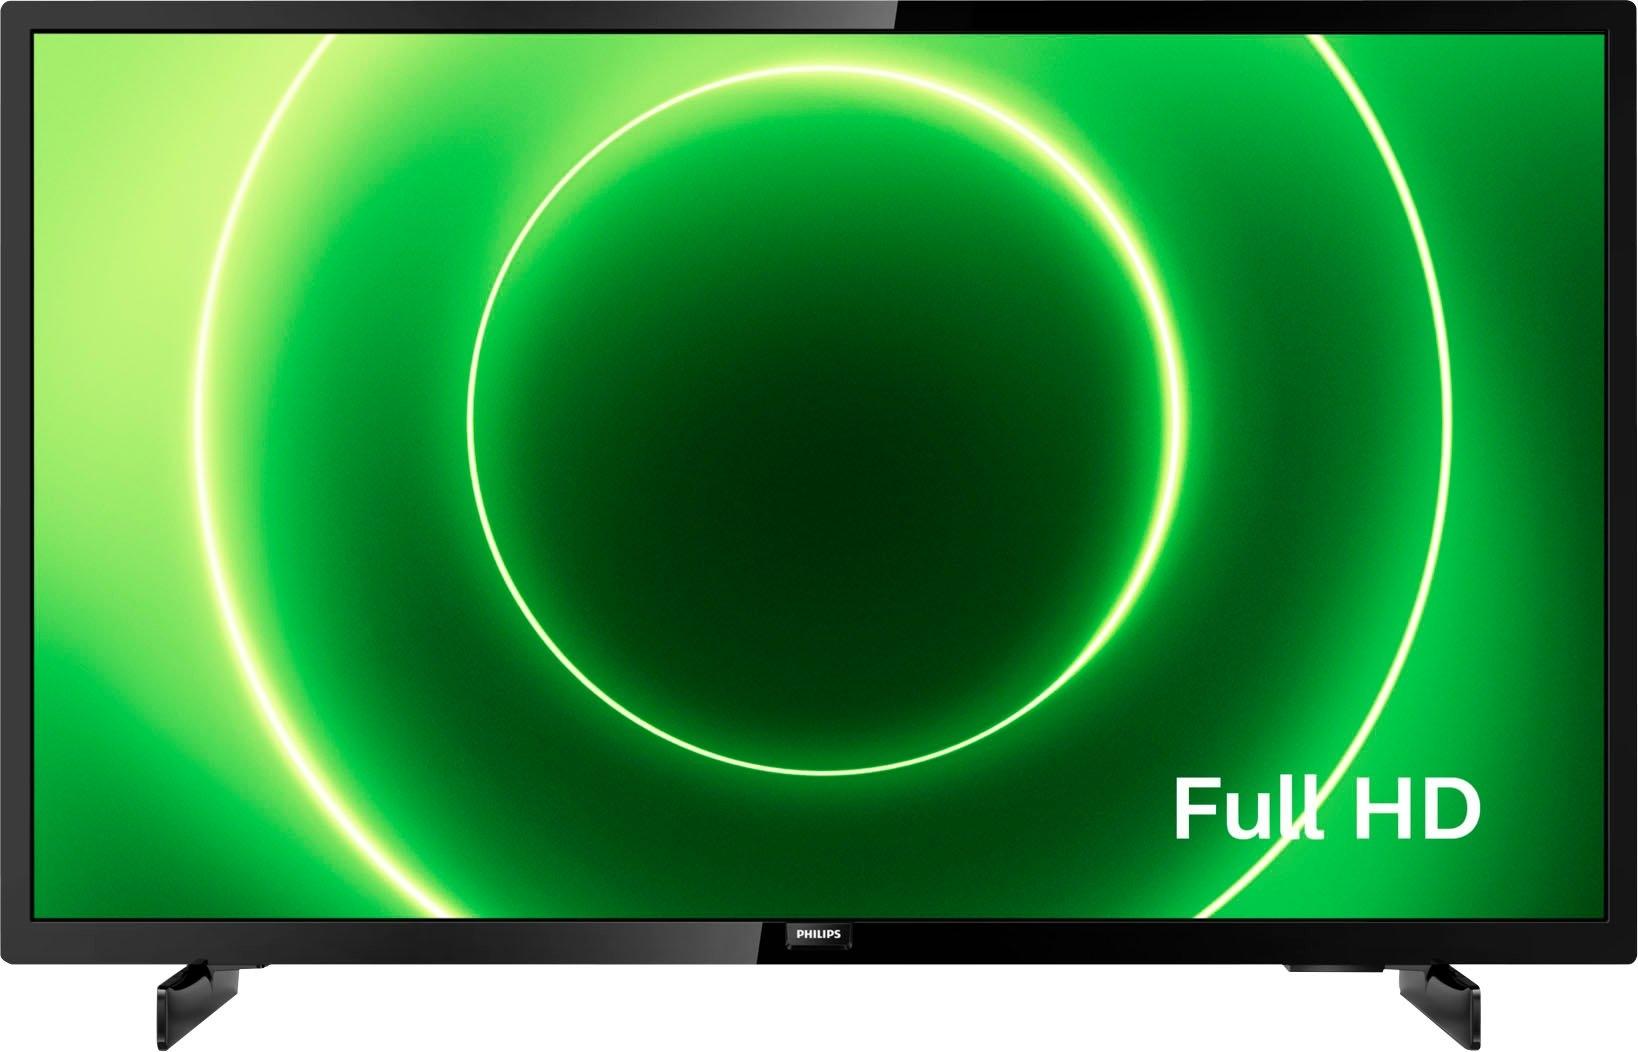 Philips led-TV 43PFS6805/12, 108 cm / 43